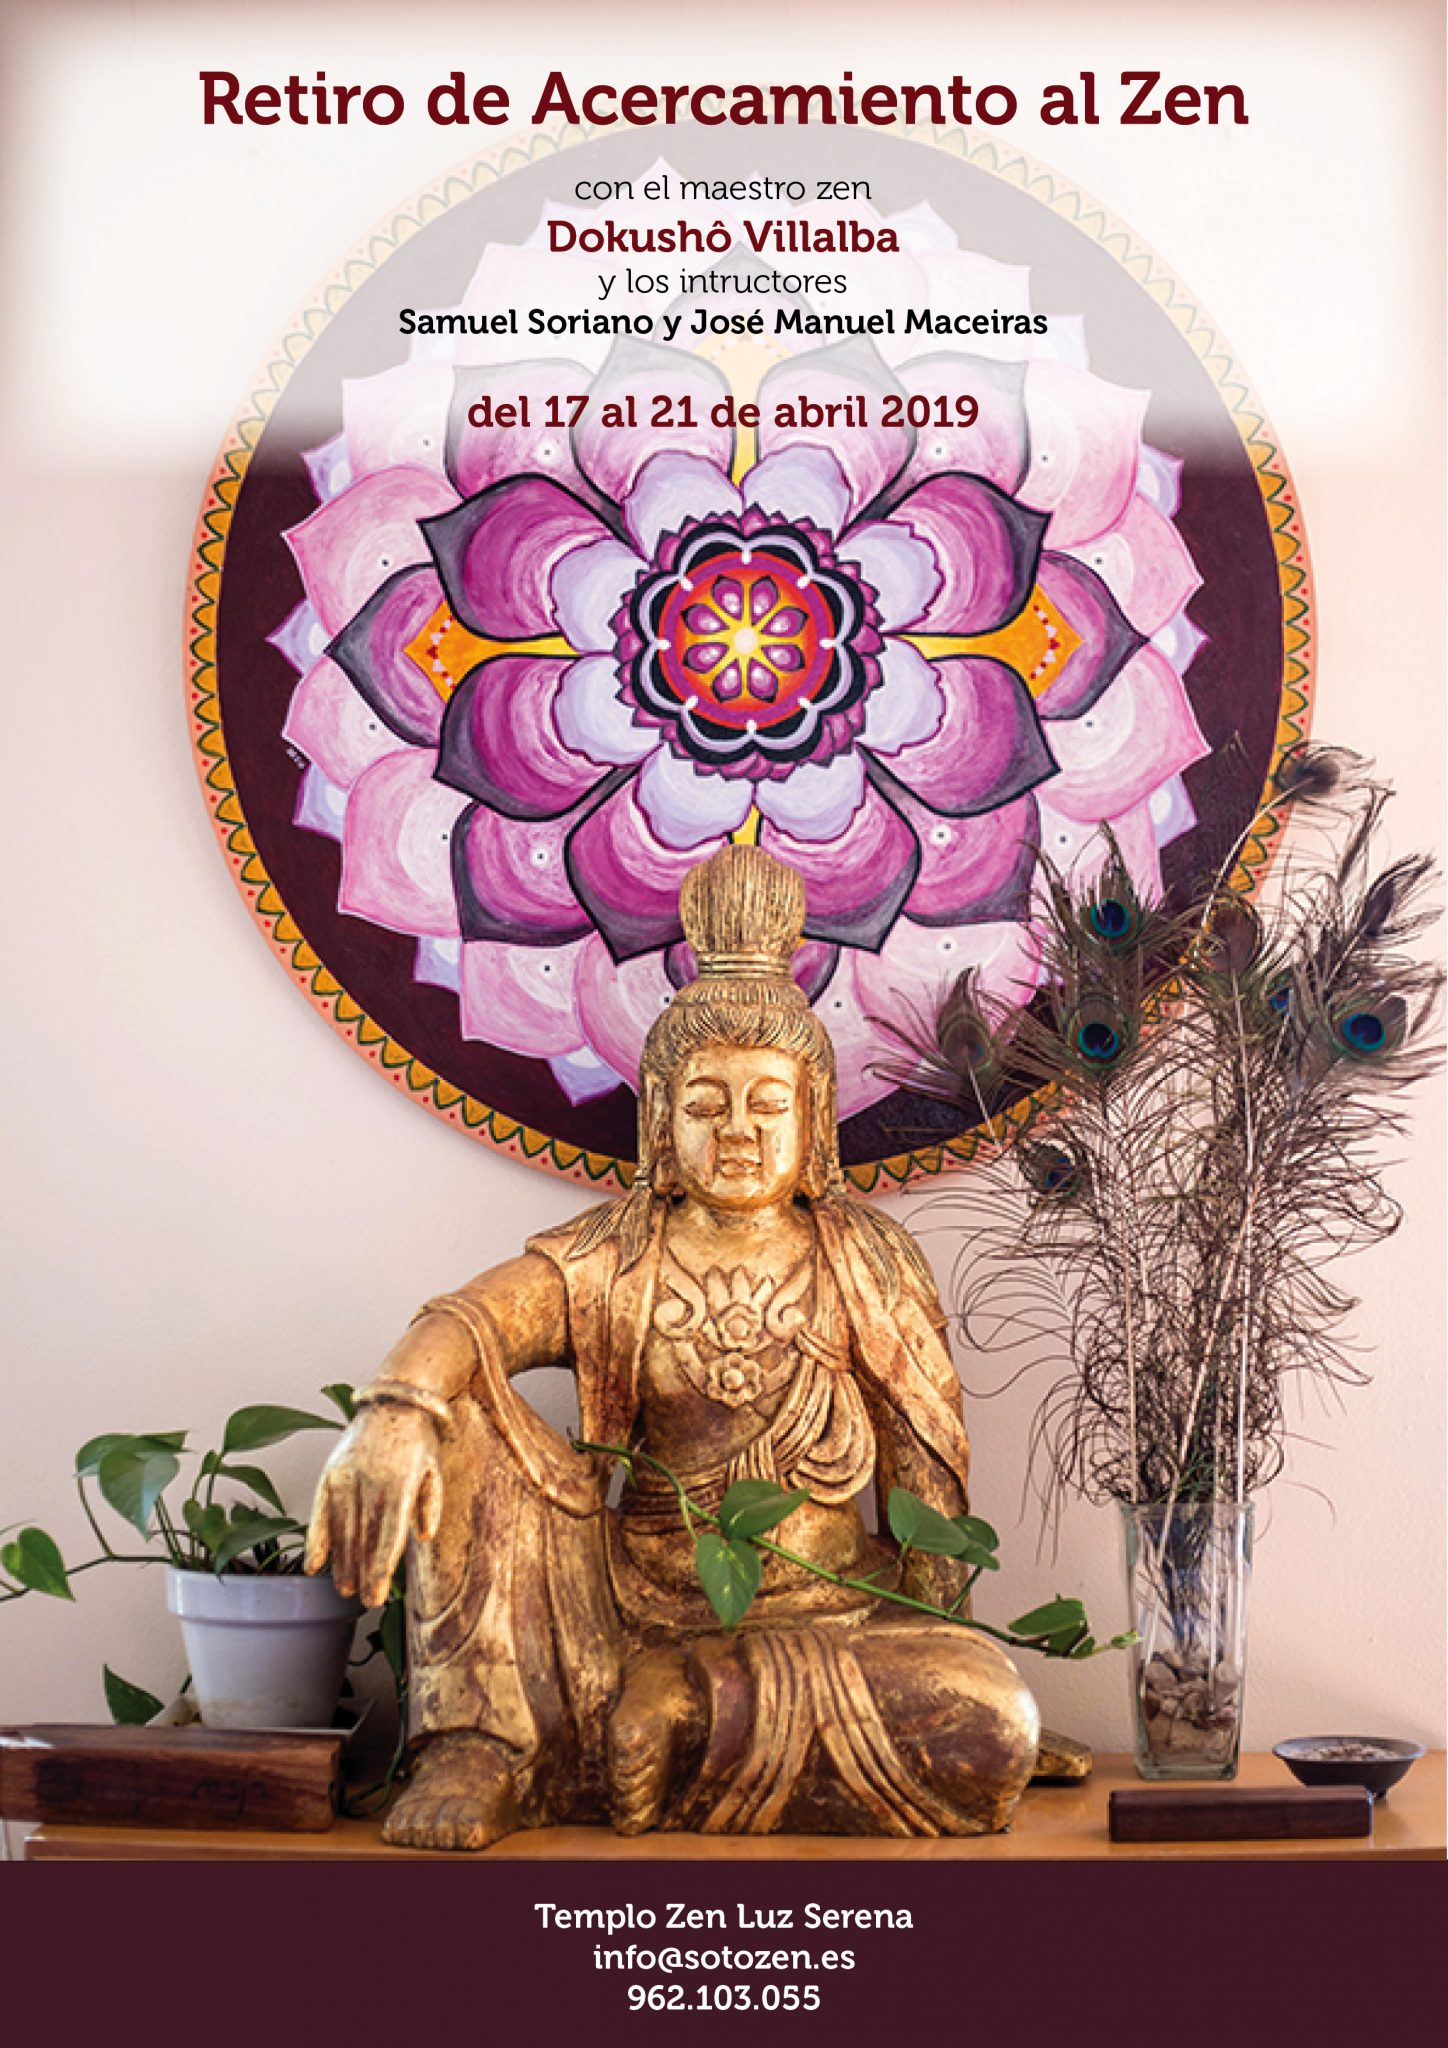 Retiro de acercamiento al Zen